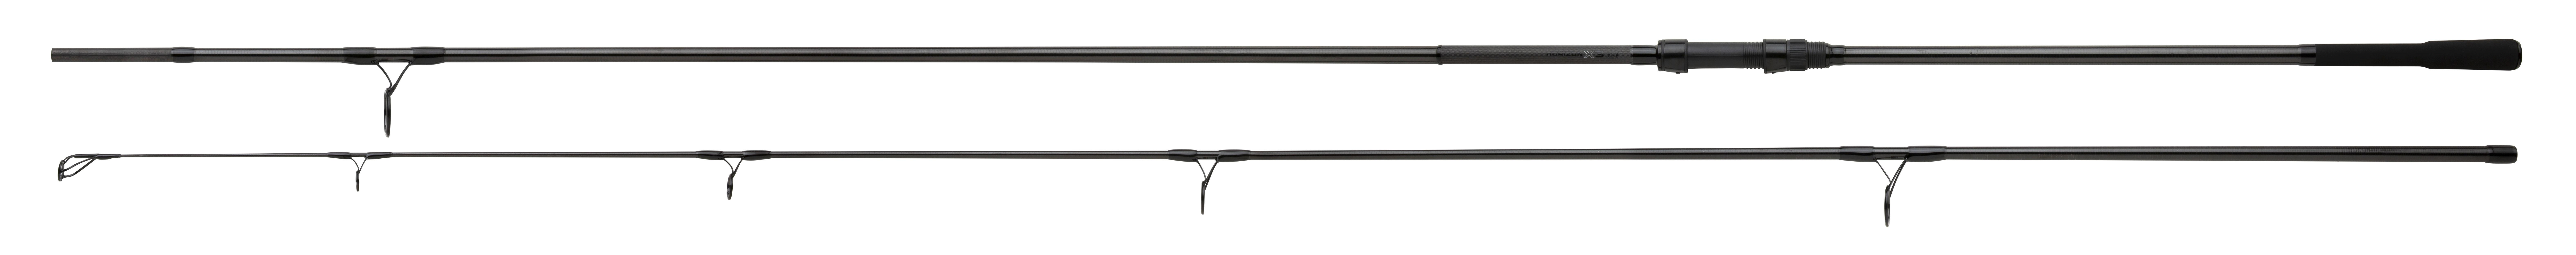 Fox Horizon x3 12ft 3,50 lbs 3,60m karpfenrute carp rod 3,5lb 12 ft 3,5lbs New